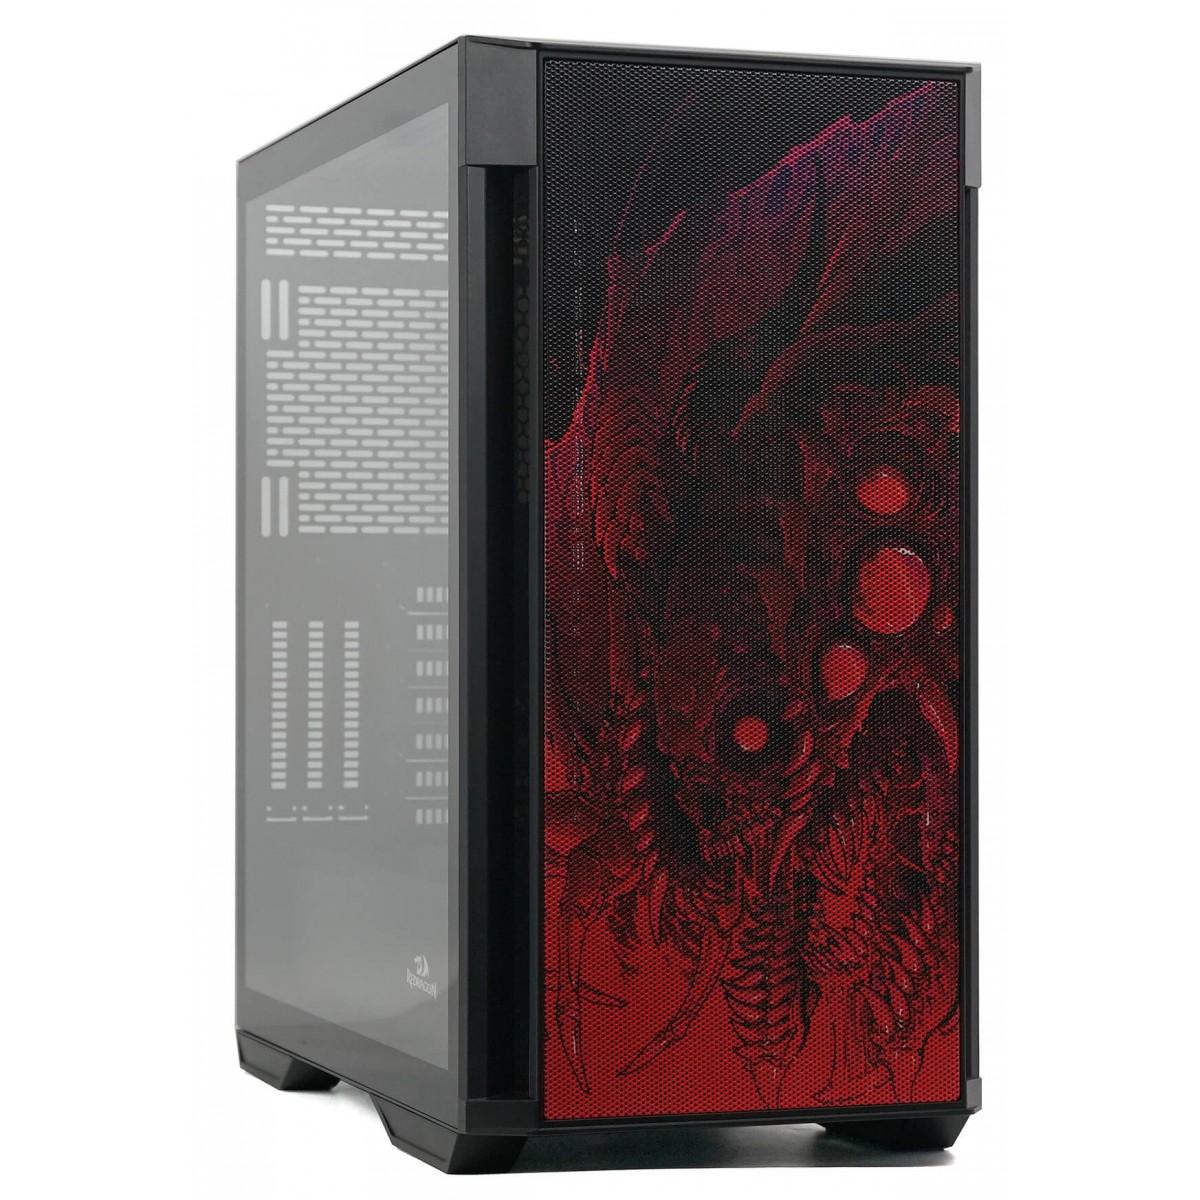 Gabinete Gamer ReDragon Infernal Dragon Strafe, Mid Tower, Vidro Temperado, Black, ATX, Sem Fonte, Sem Fan, GC-706IF